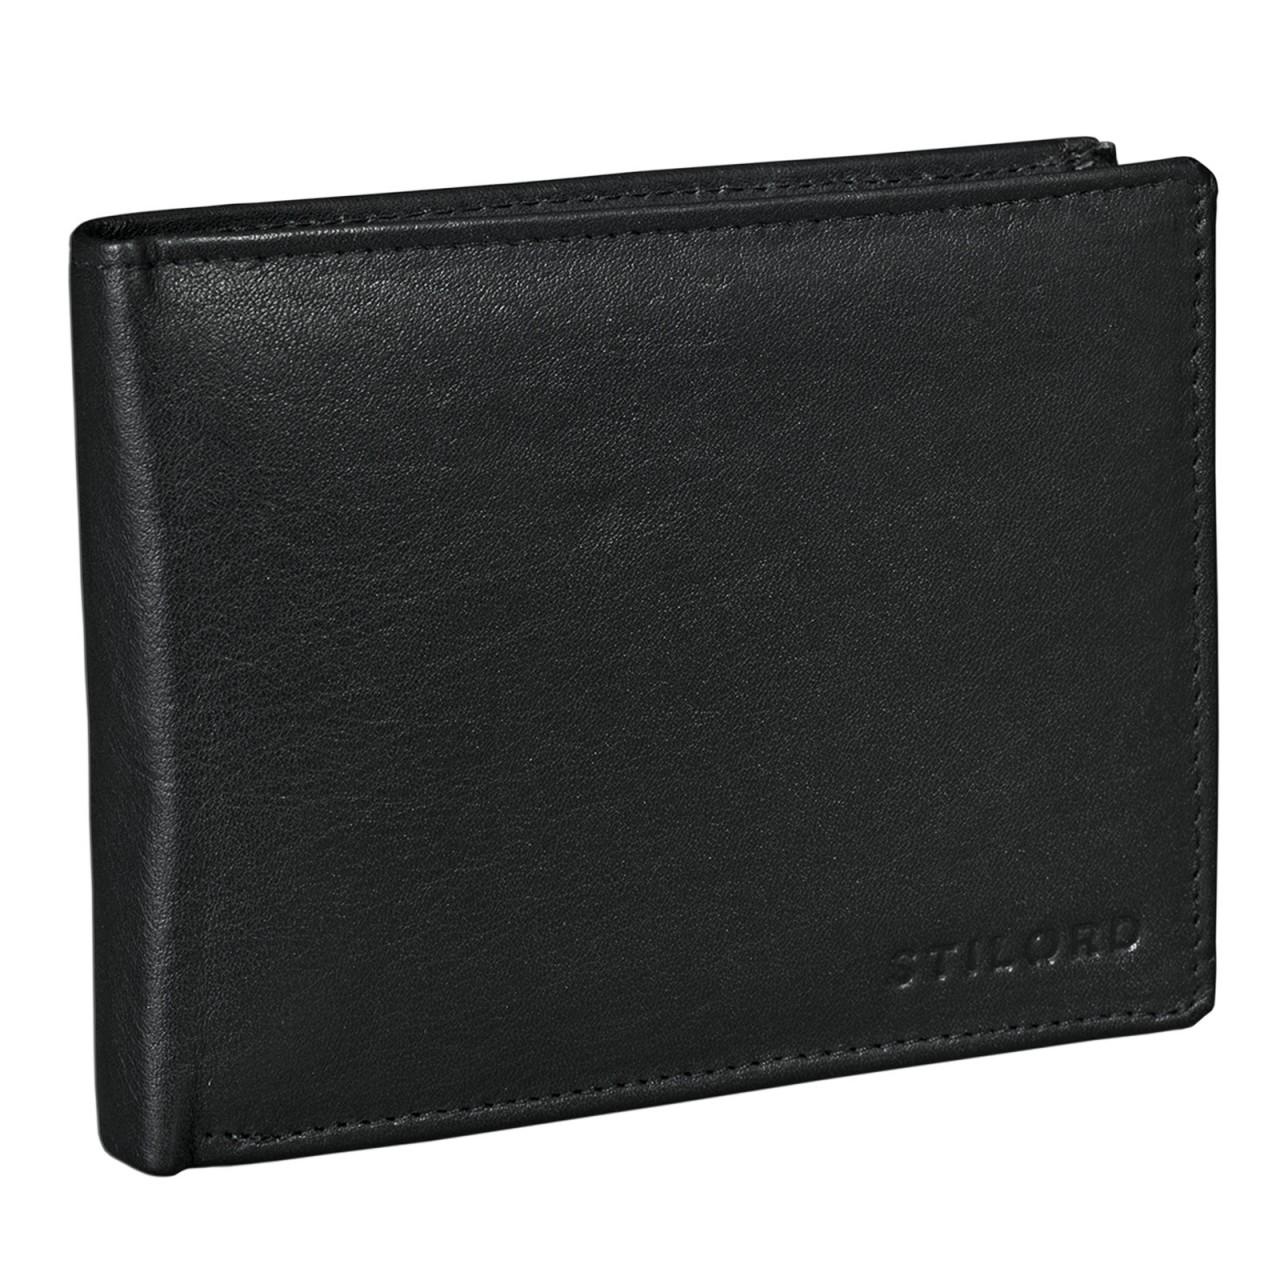 EC-Karten Geldbörse Leder schwarz